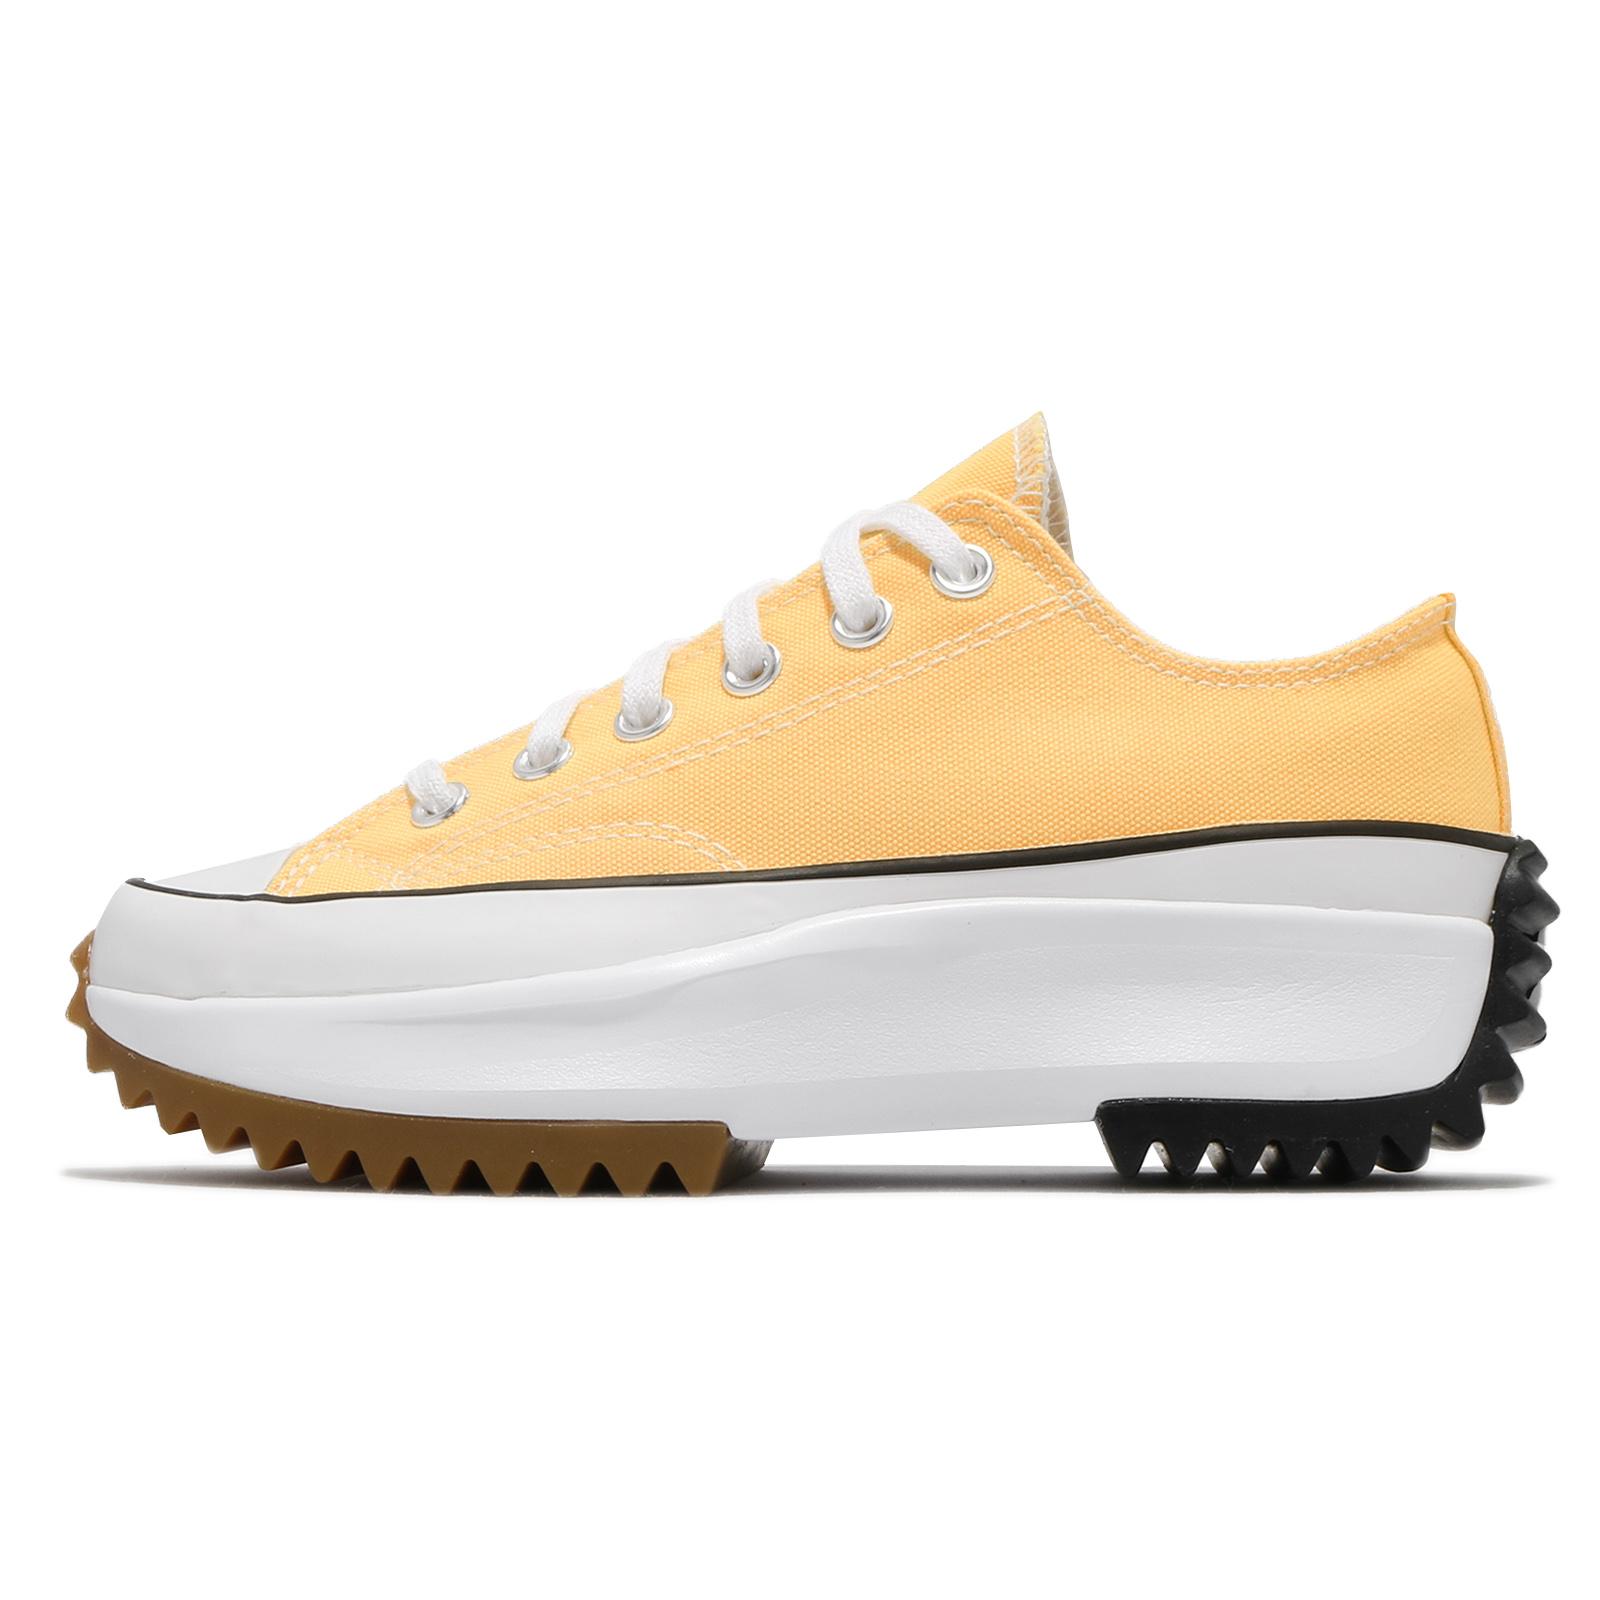 Converse 休閒鞋 Run Star Hike 黃 白 厚底 增高 鋸齒鞋 女鞋 帆布鞋【ACS】 170778C